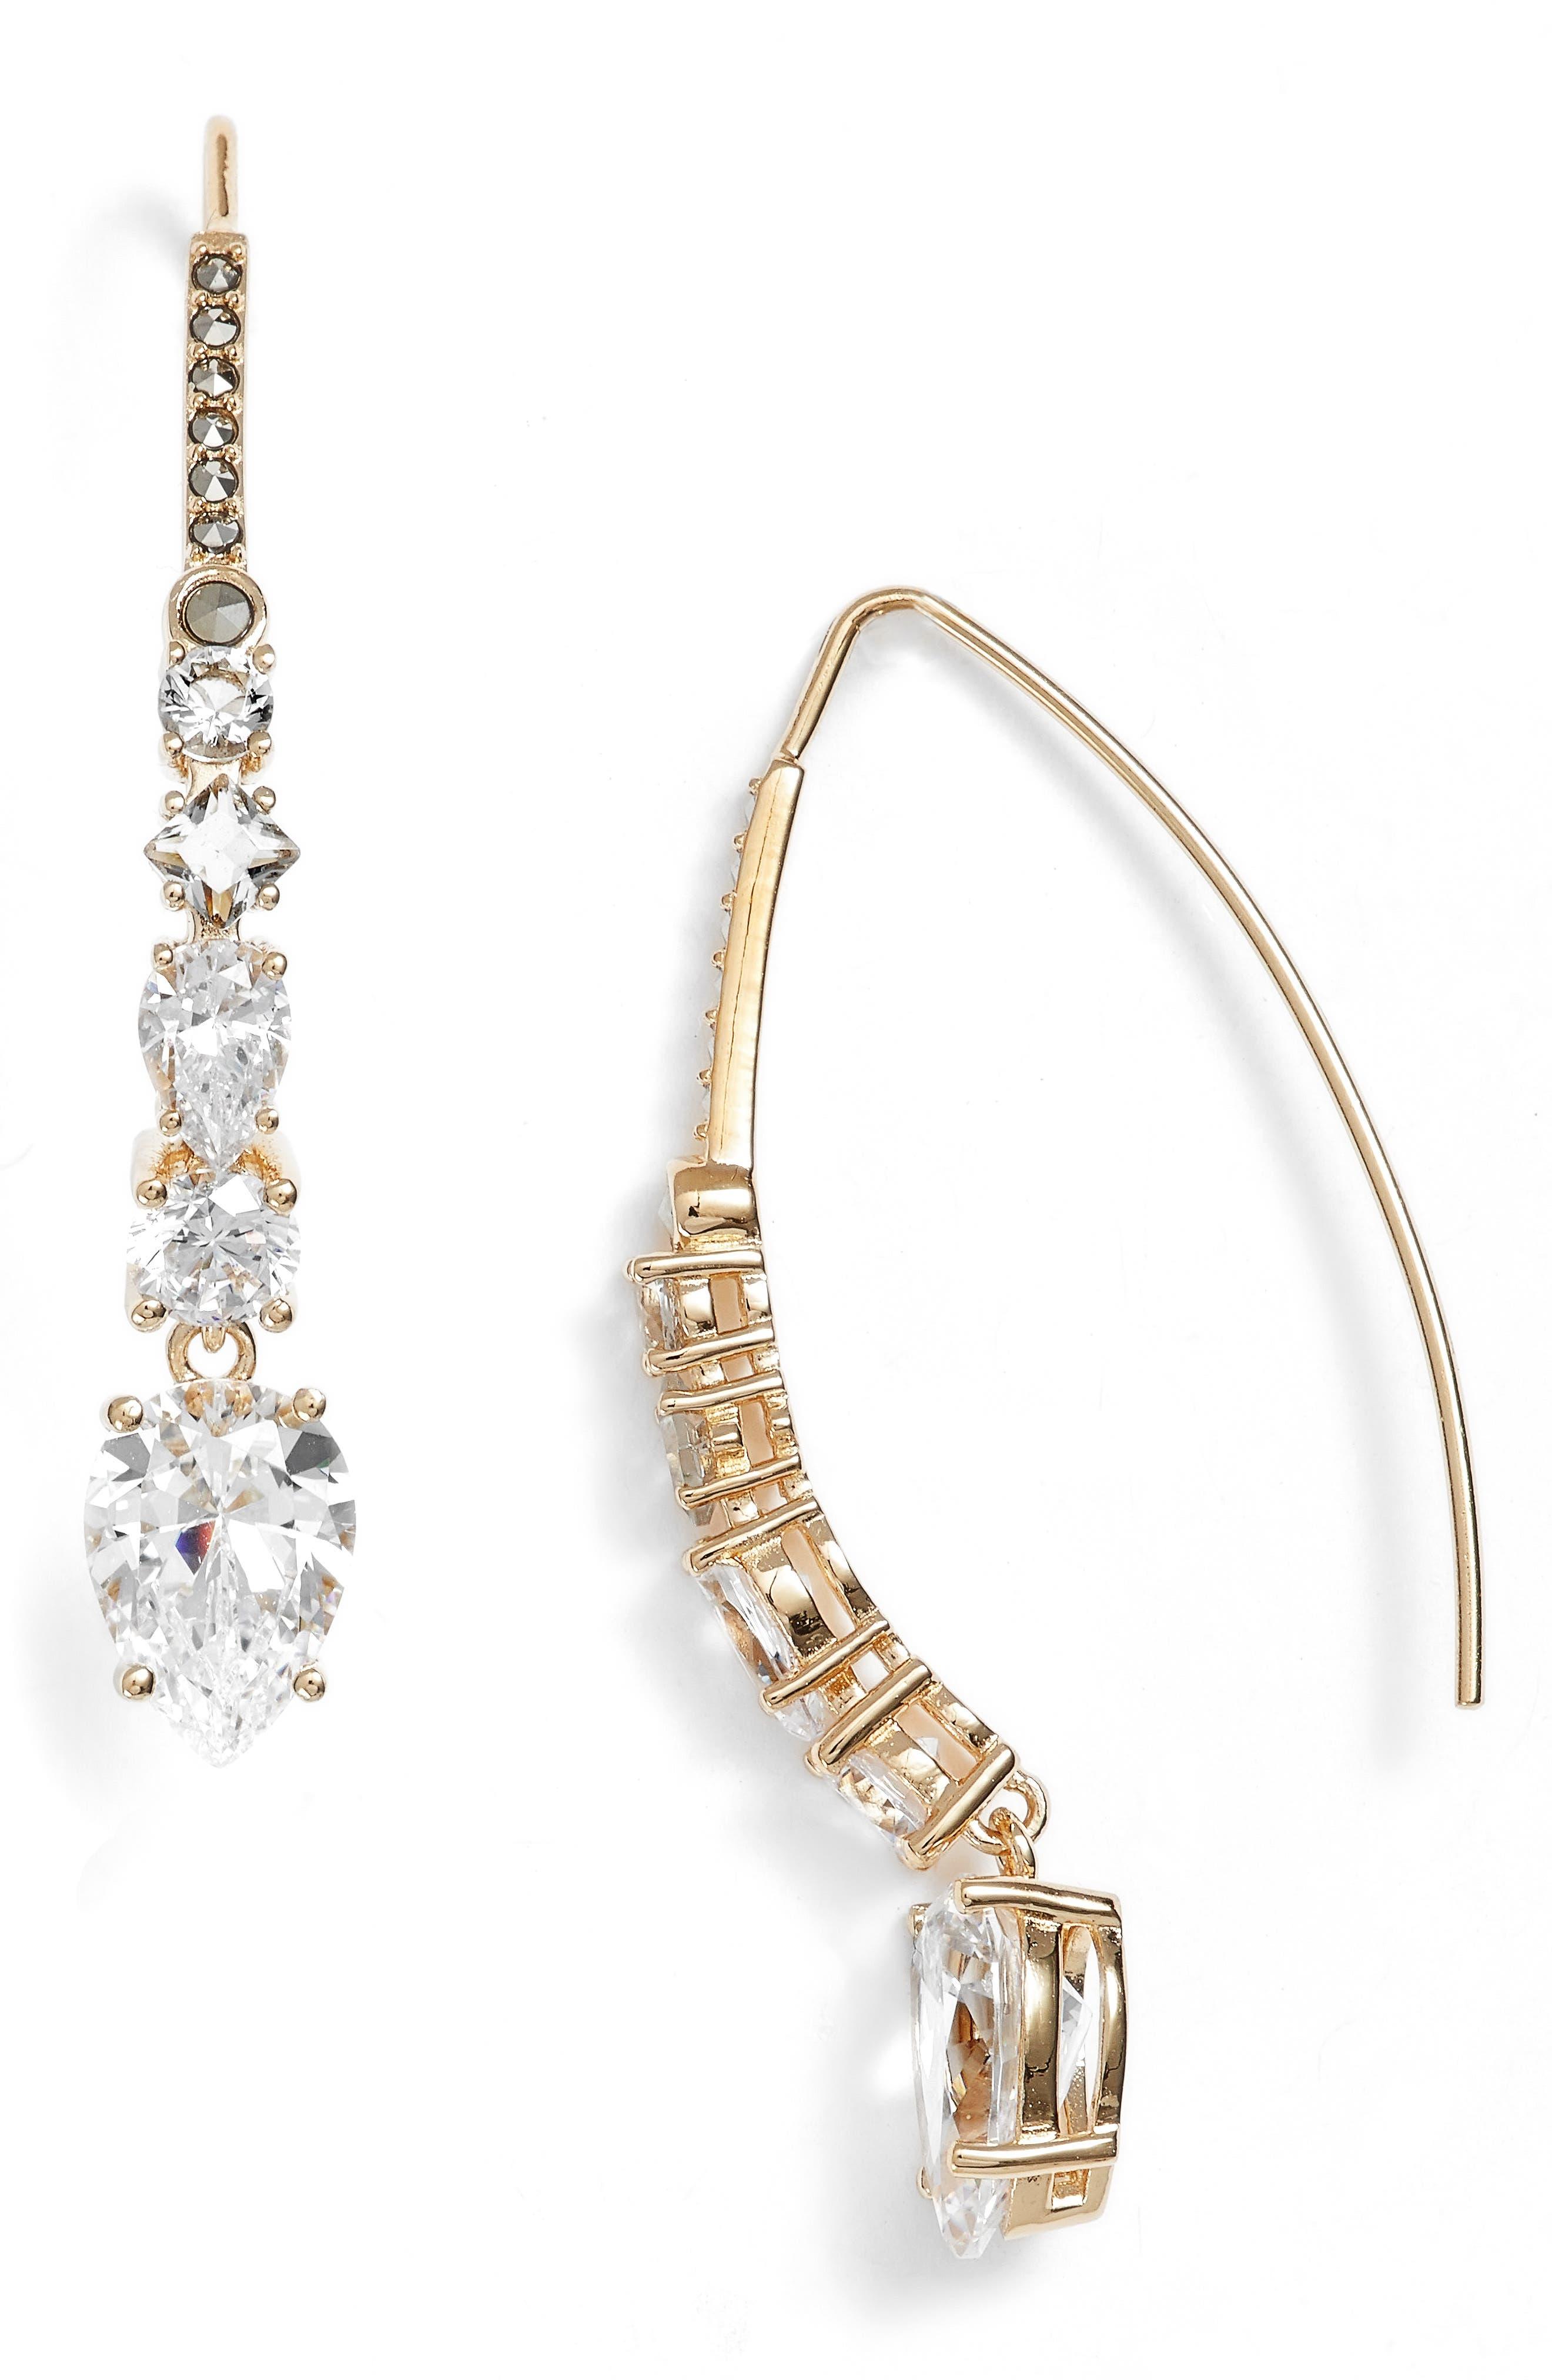 Judith Jack Cubic Zirconia Threader Earrings